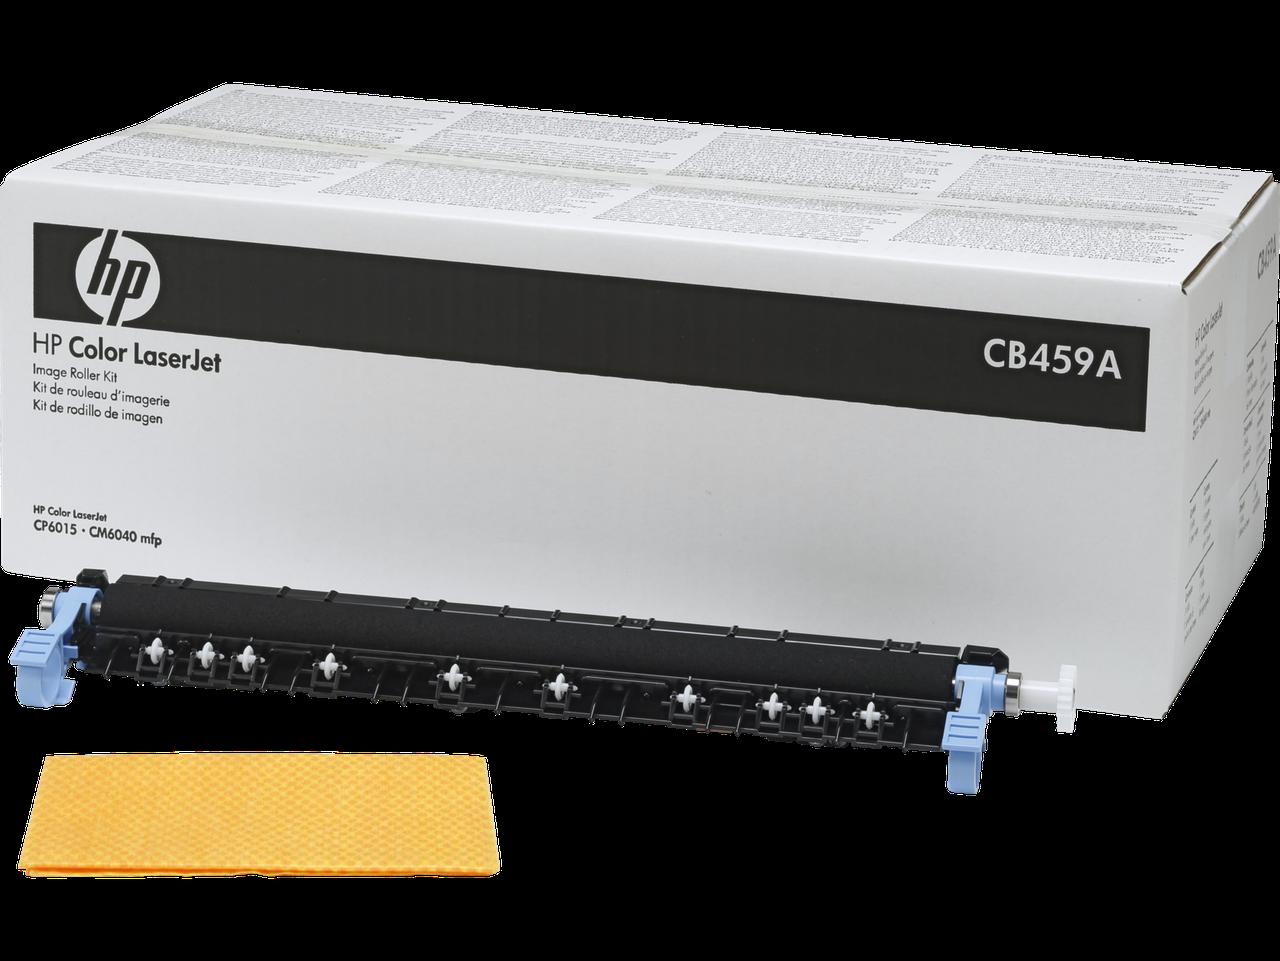 HP CB459A Комплект роликов LLC Roller Kit для Color LaserJet CP6015/CM6030/CM6040